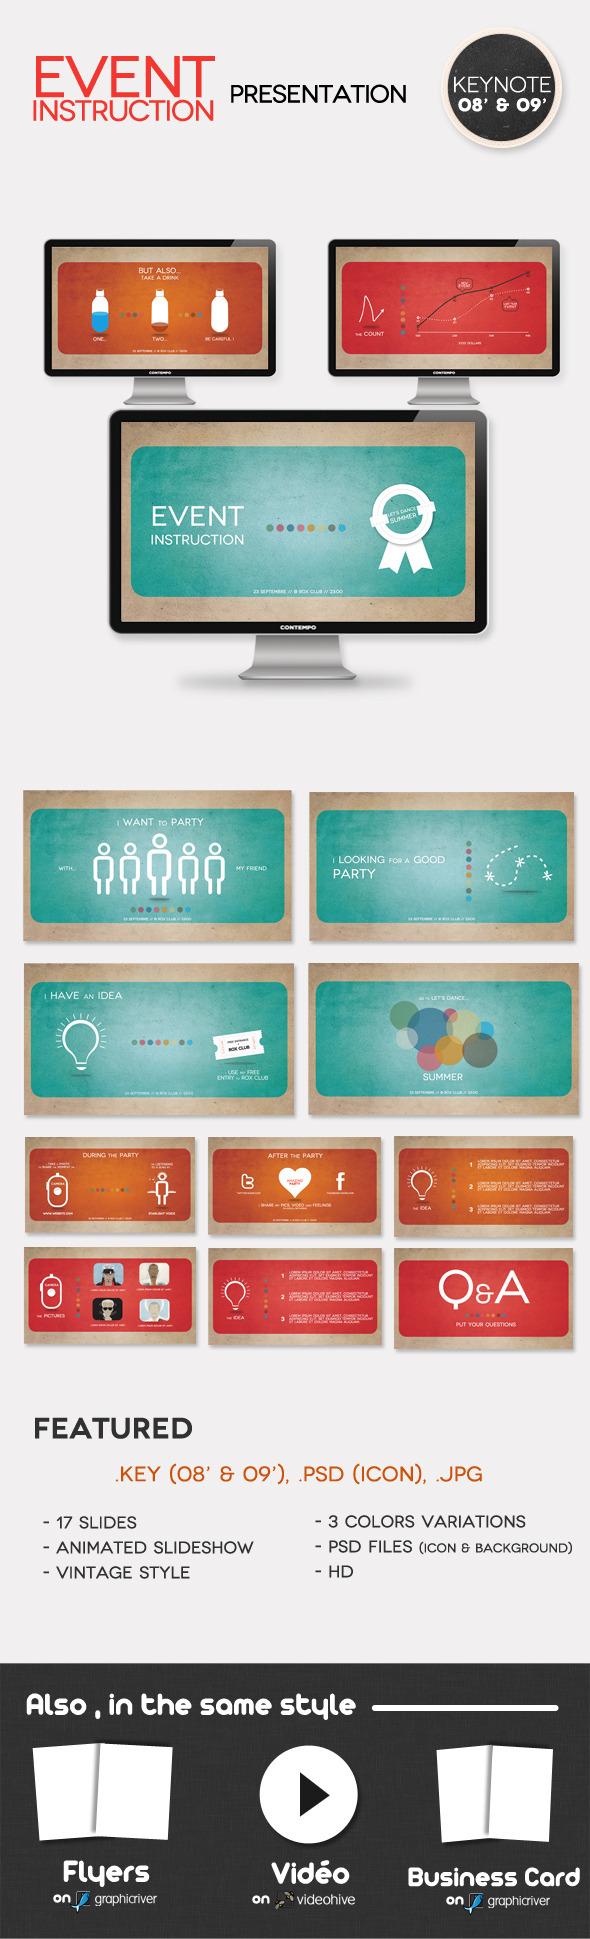 Event Instruction Presentation - Creative Keynote Templates